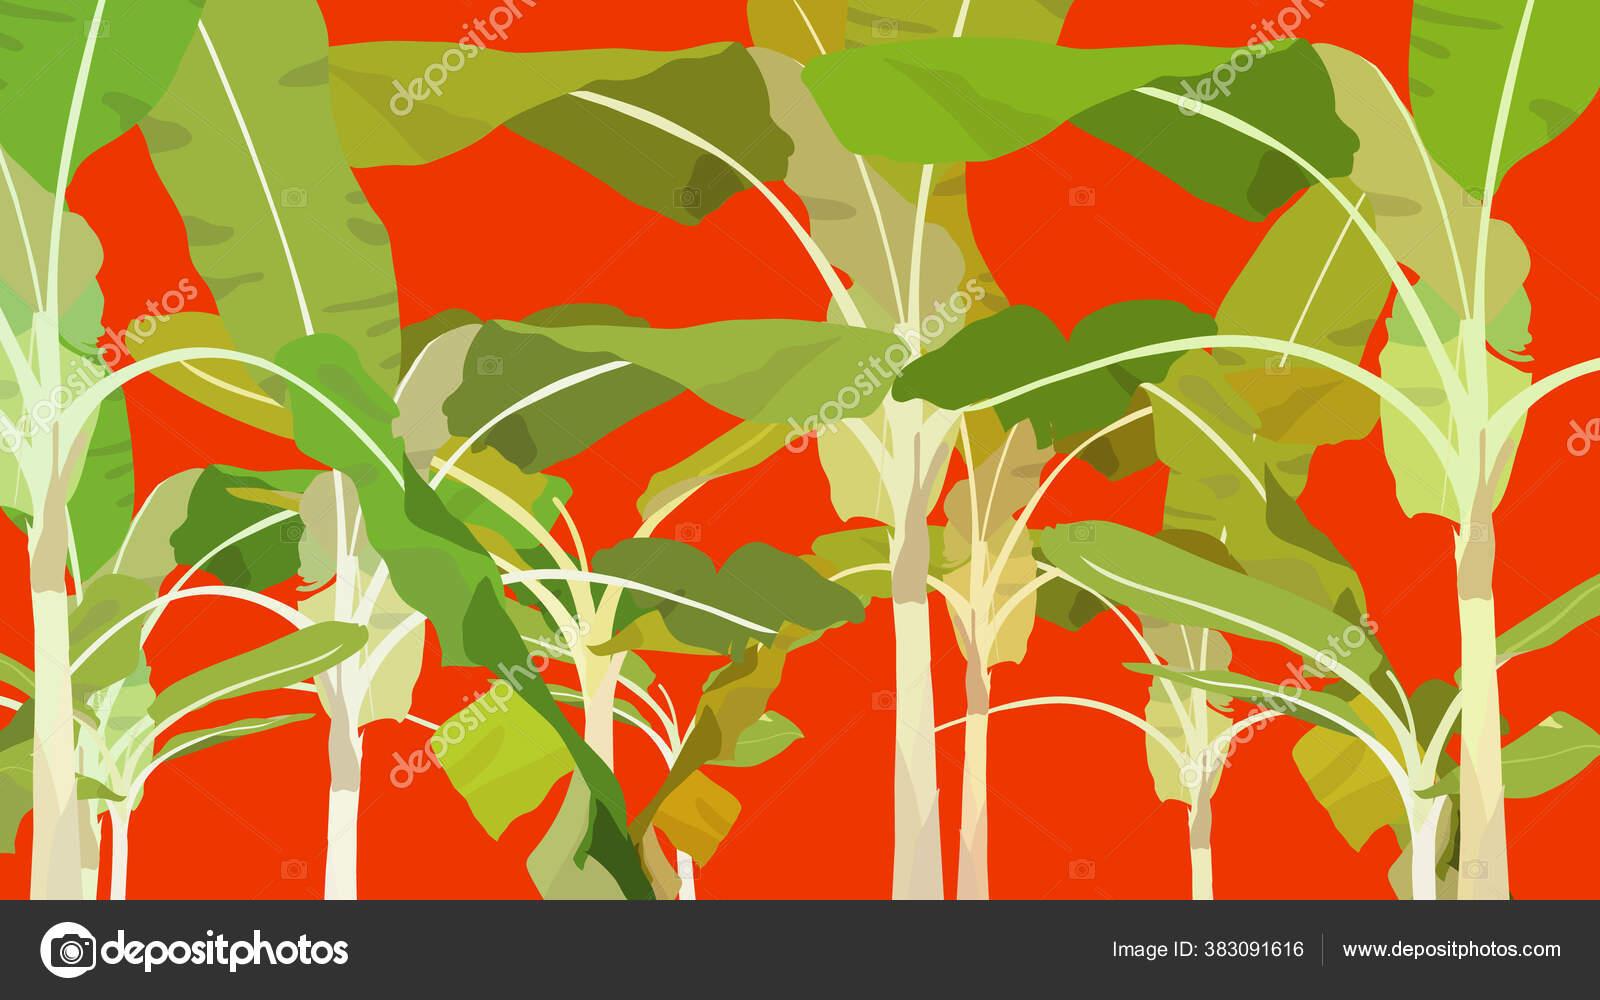 Hot Tropic Exotic Banana Jungle Flat Simple Vector Summer Vibe Stock Vector C Summercandy 383091616